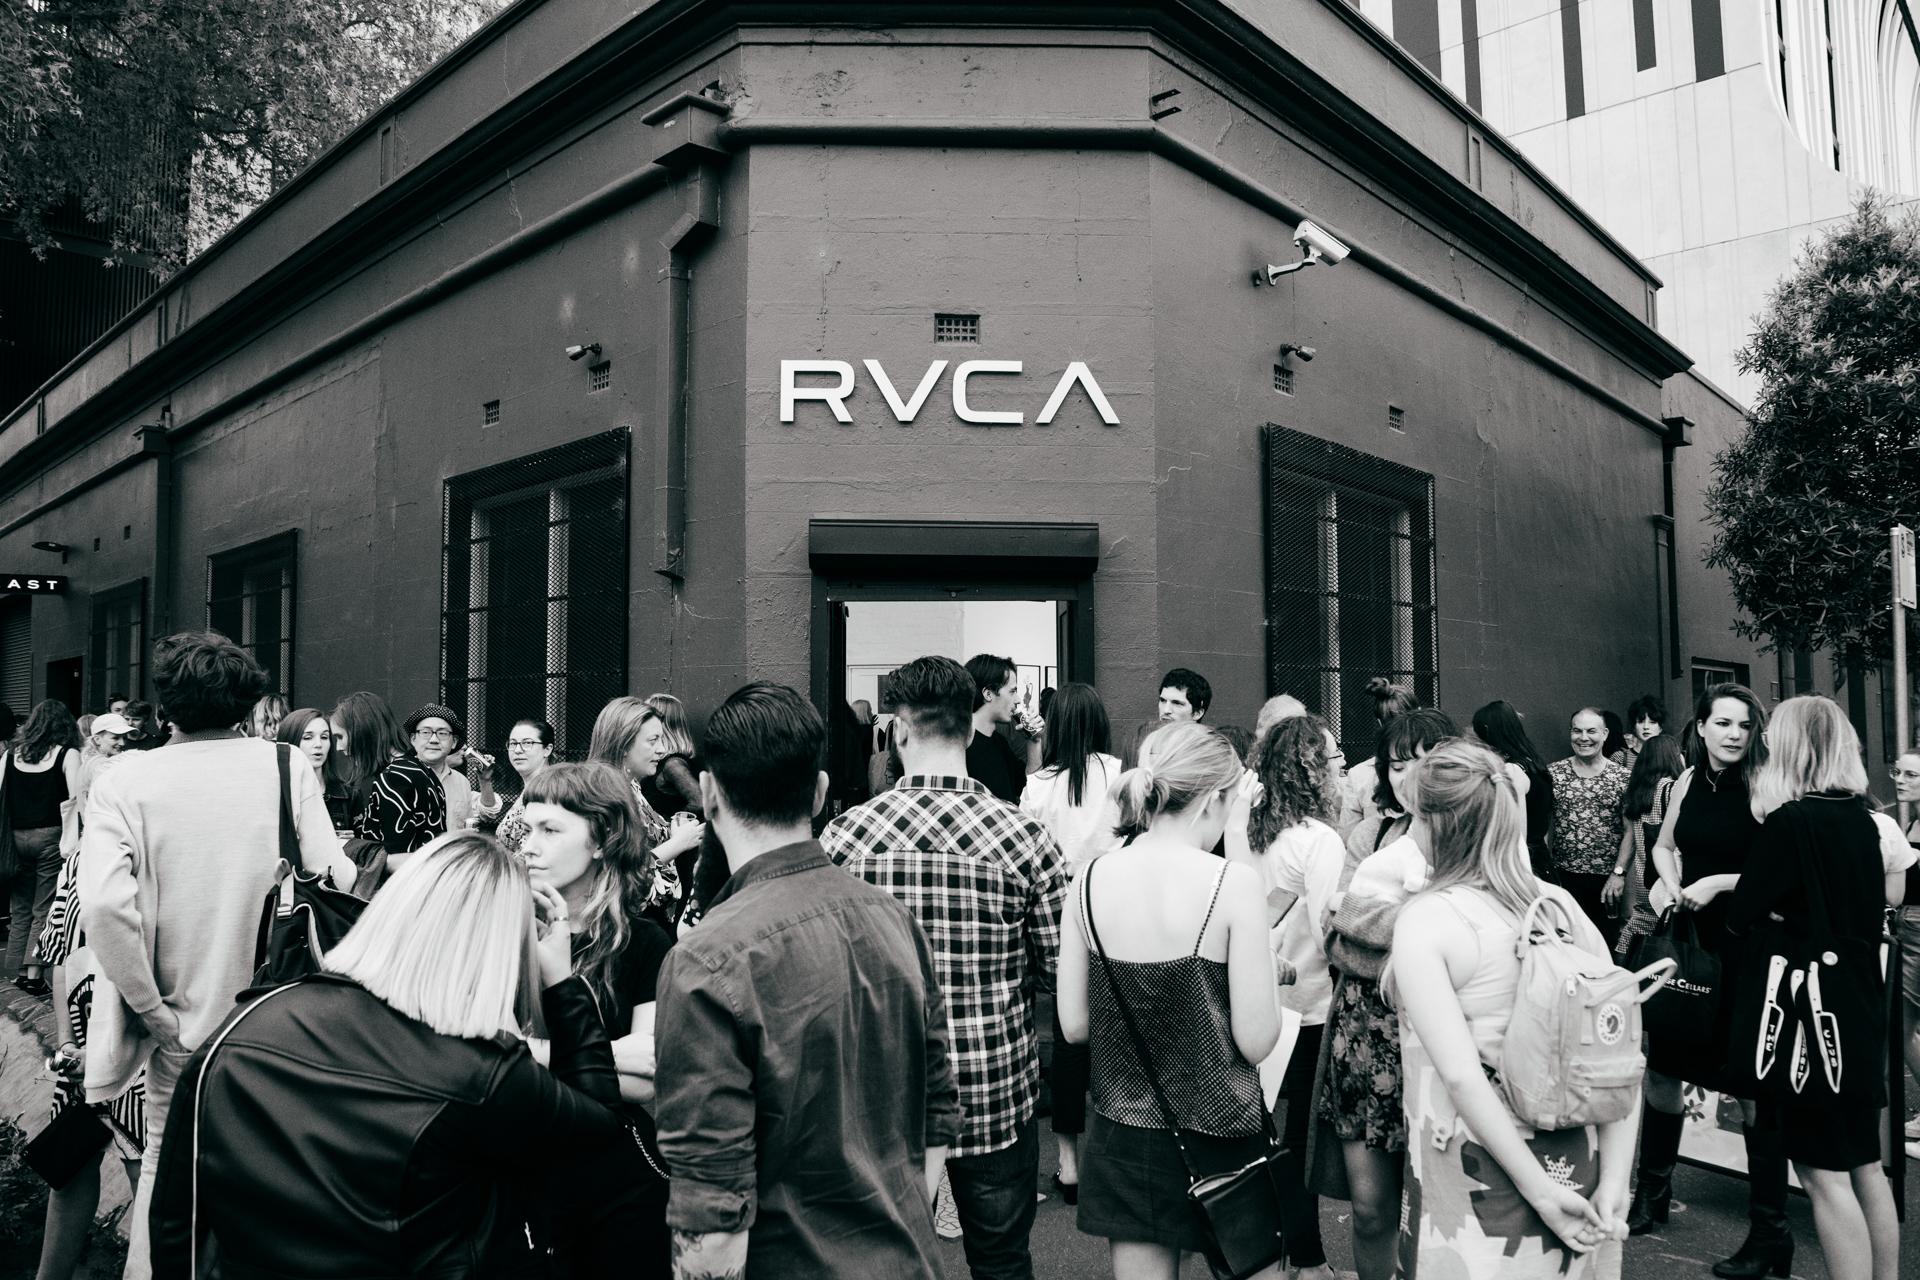 RVCA_Gallery.jpg